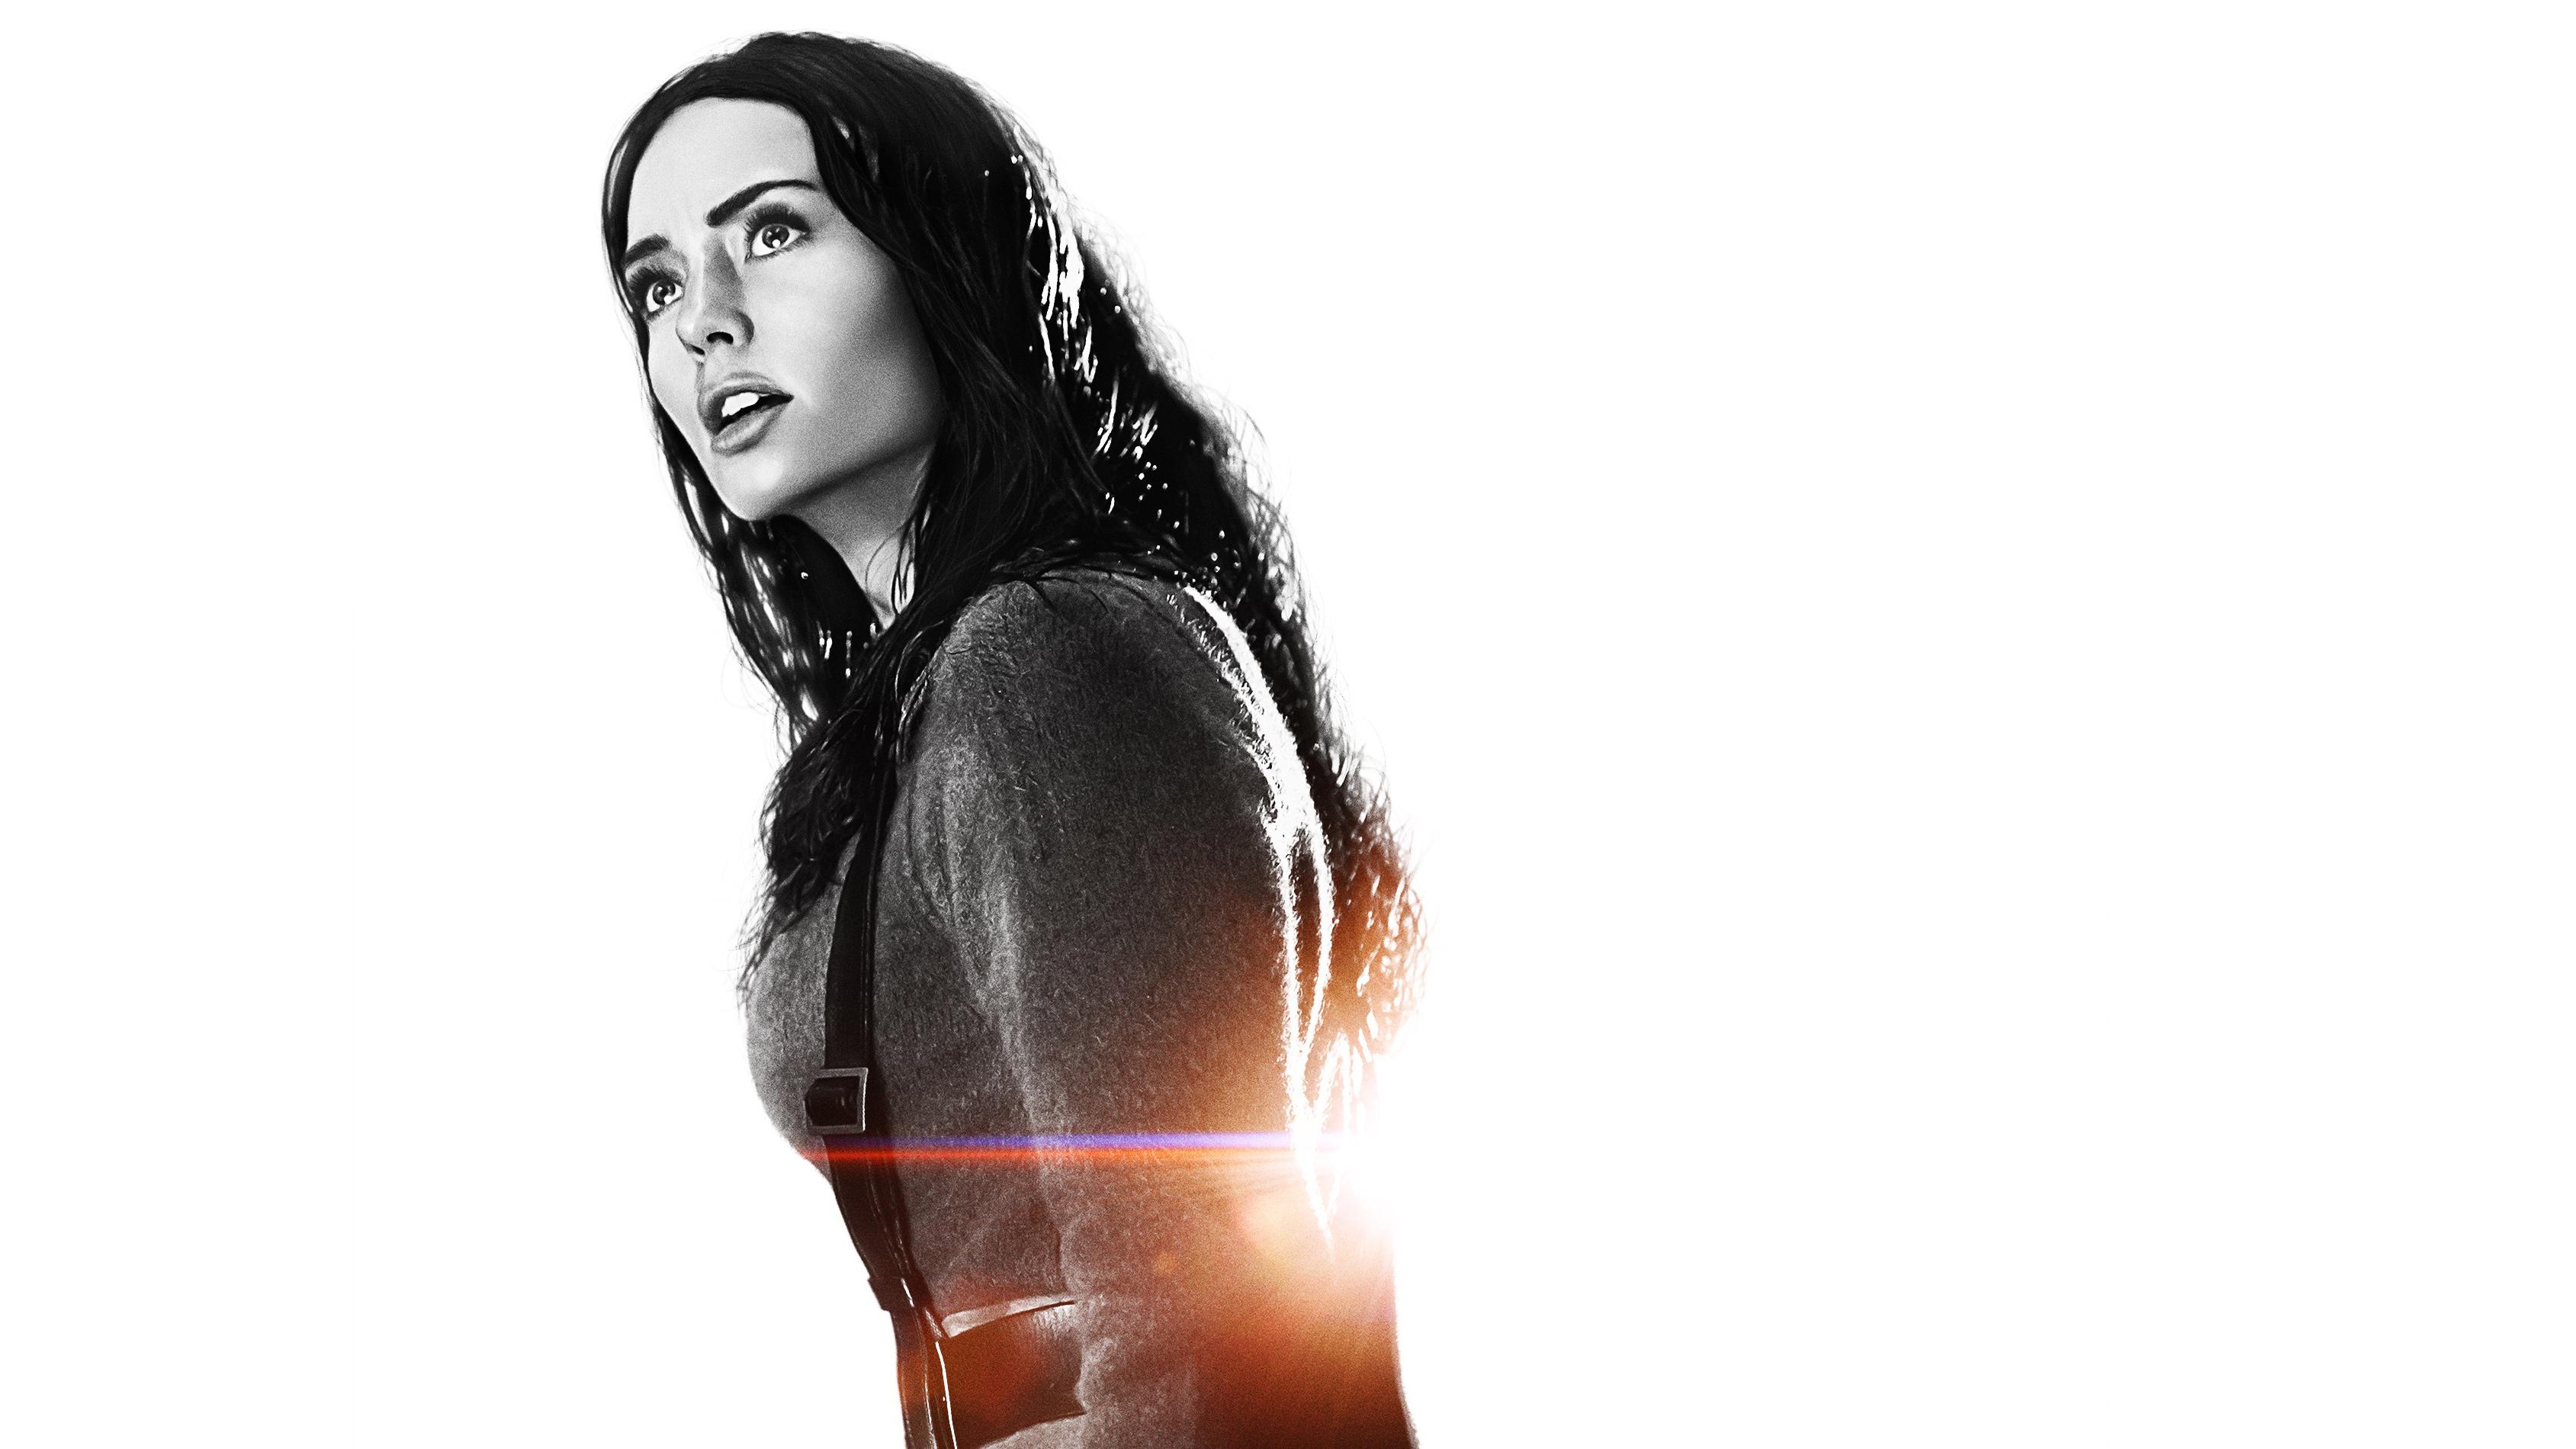 #laura Haddock, #transformers - Laura Haddock Transformers The Last Knight Vivian , HD Wallpaper & Backgrounds